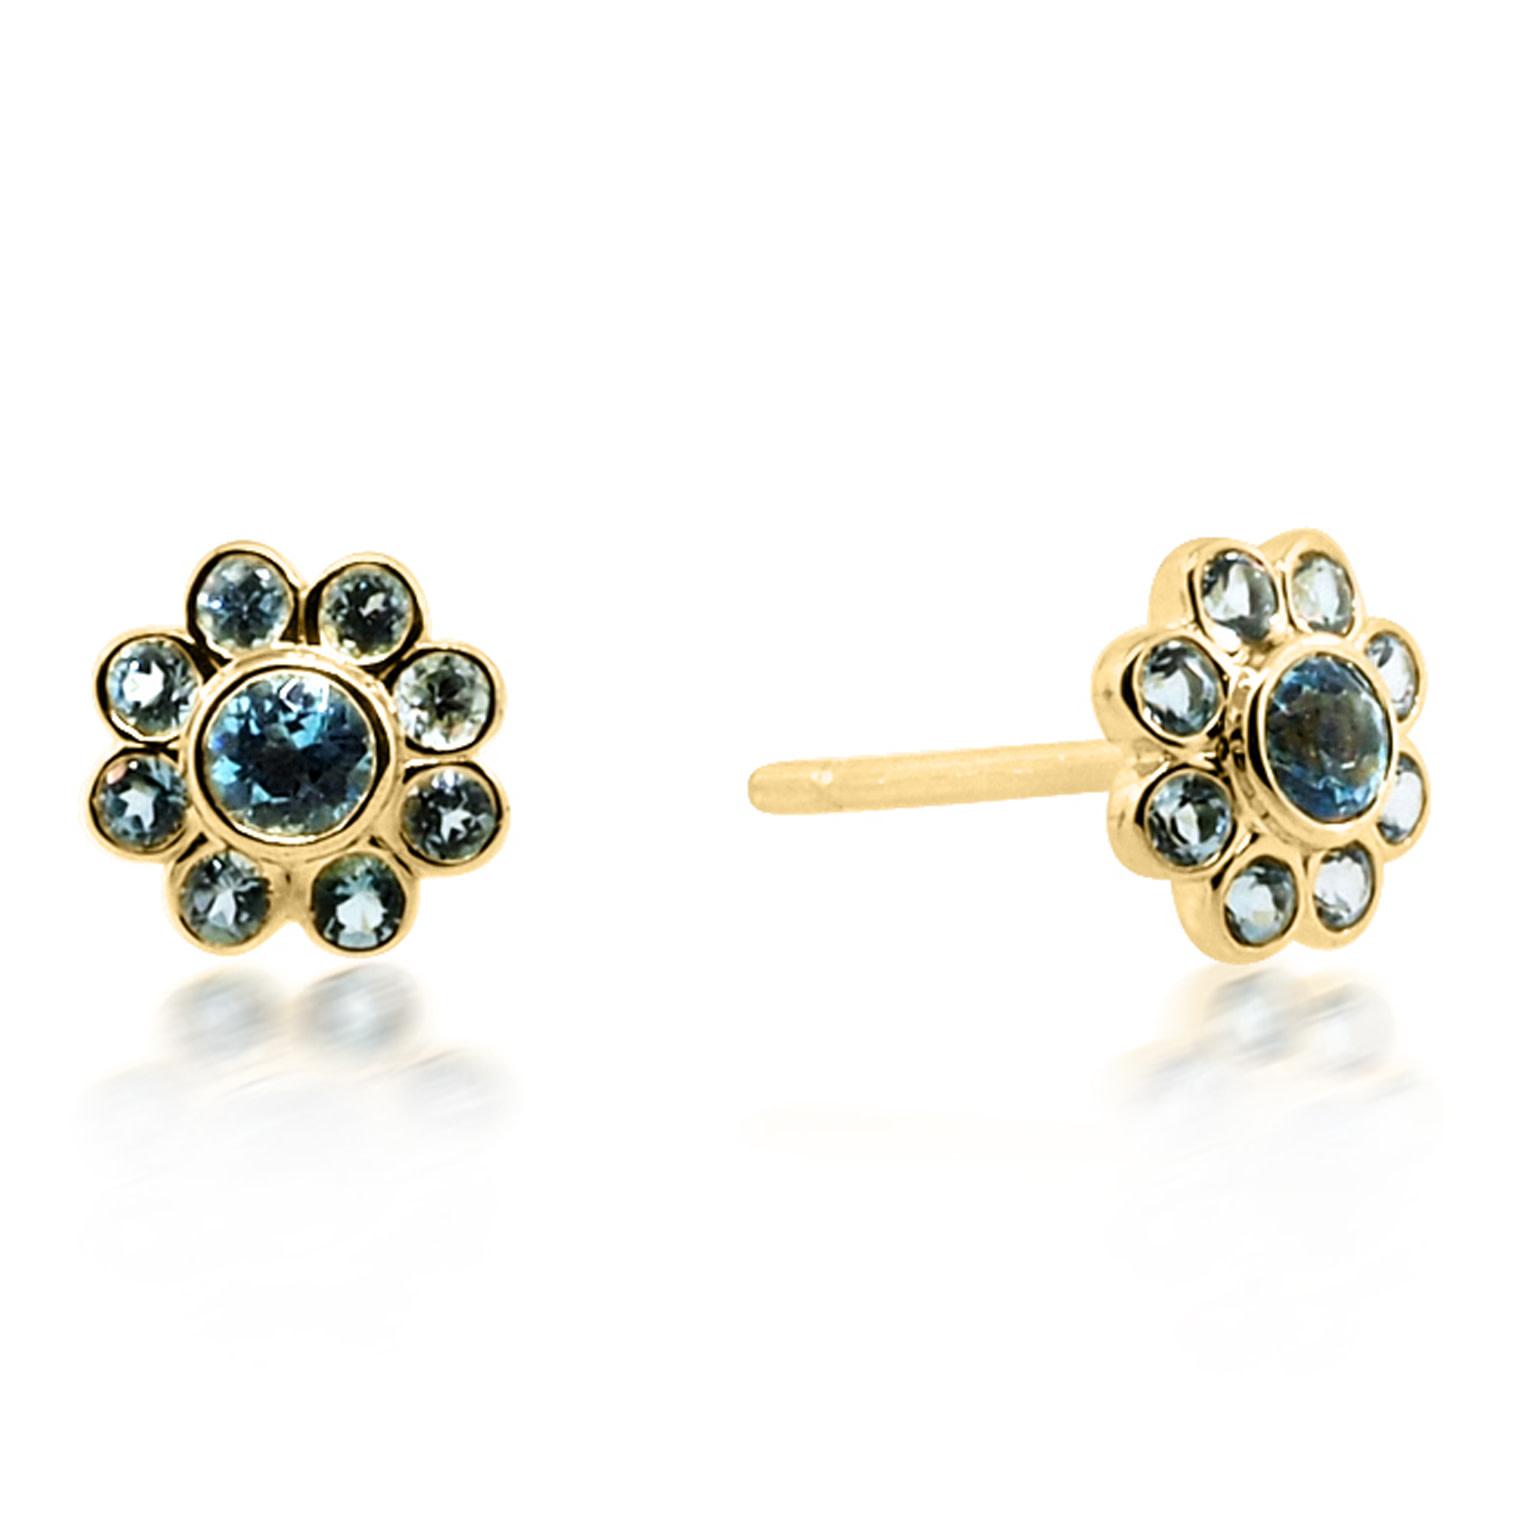 Beverley K Collection Blue Topaz Flower Earrings